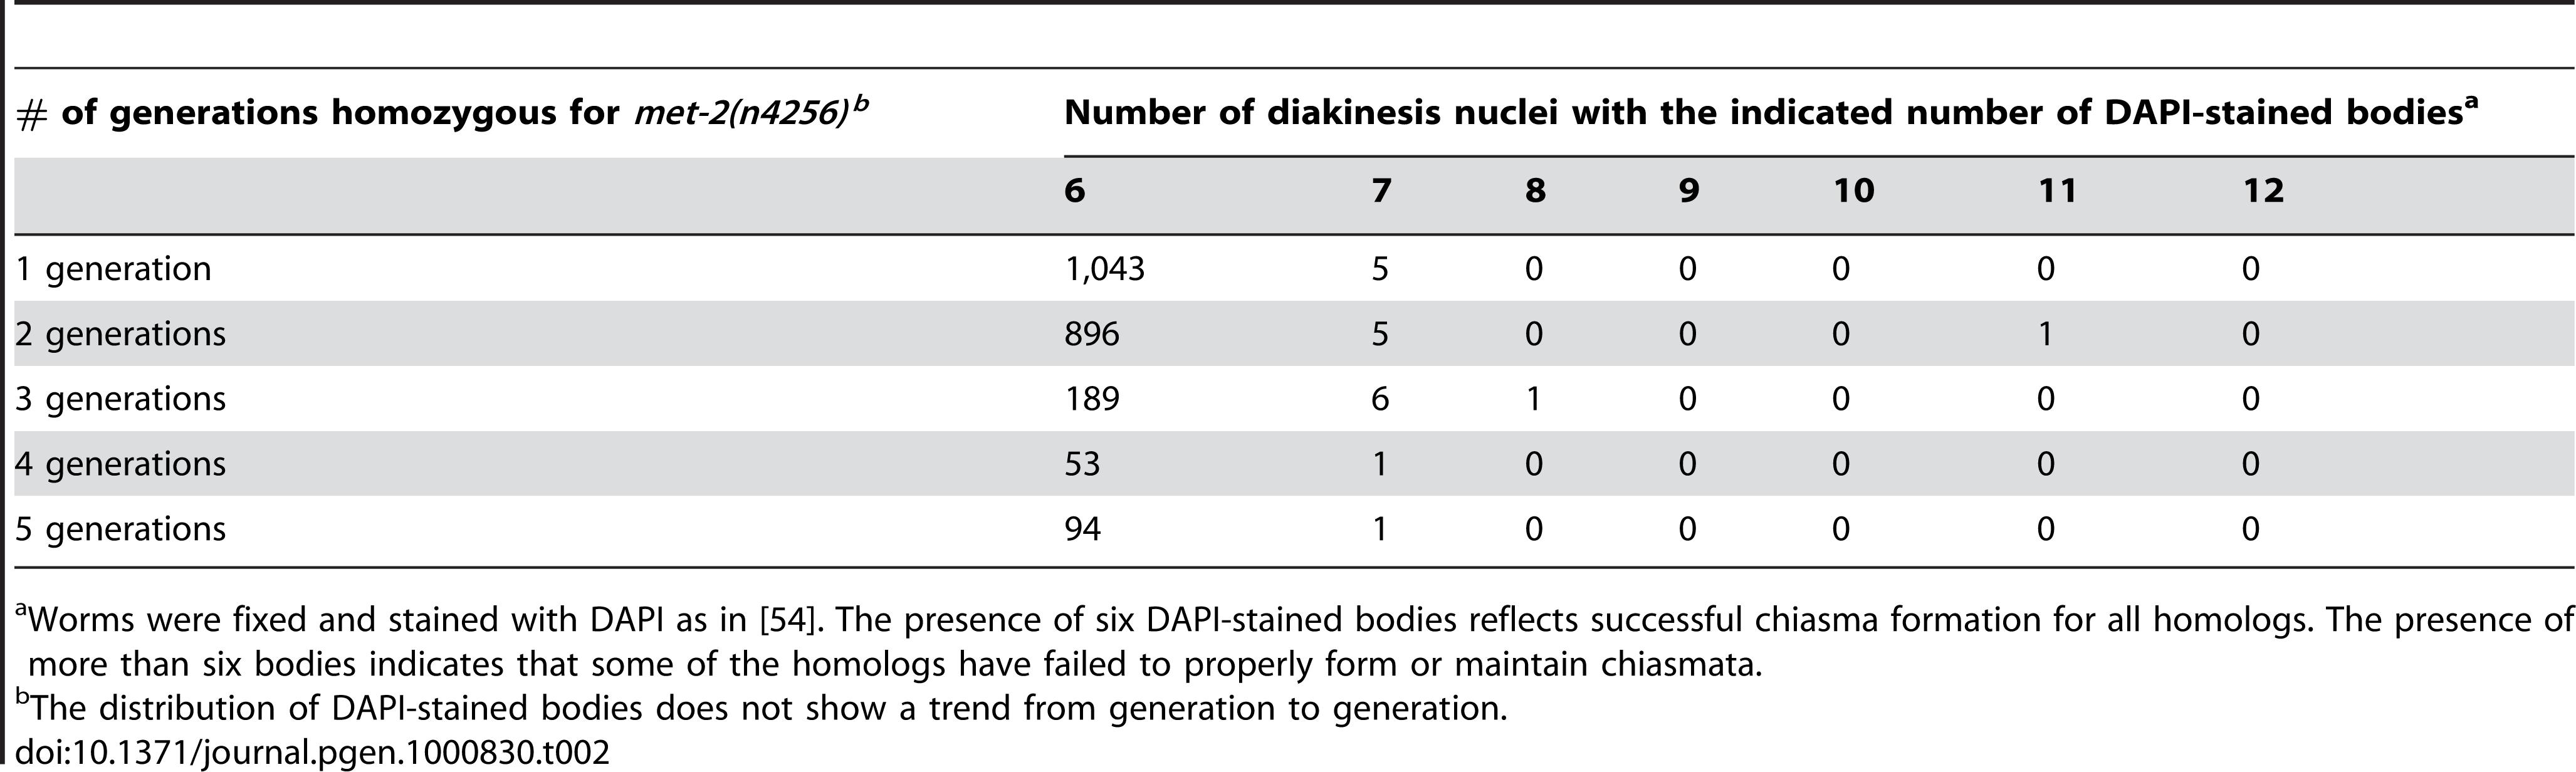 Karyotype analysis of diakinesis-stage oocytes.